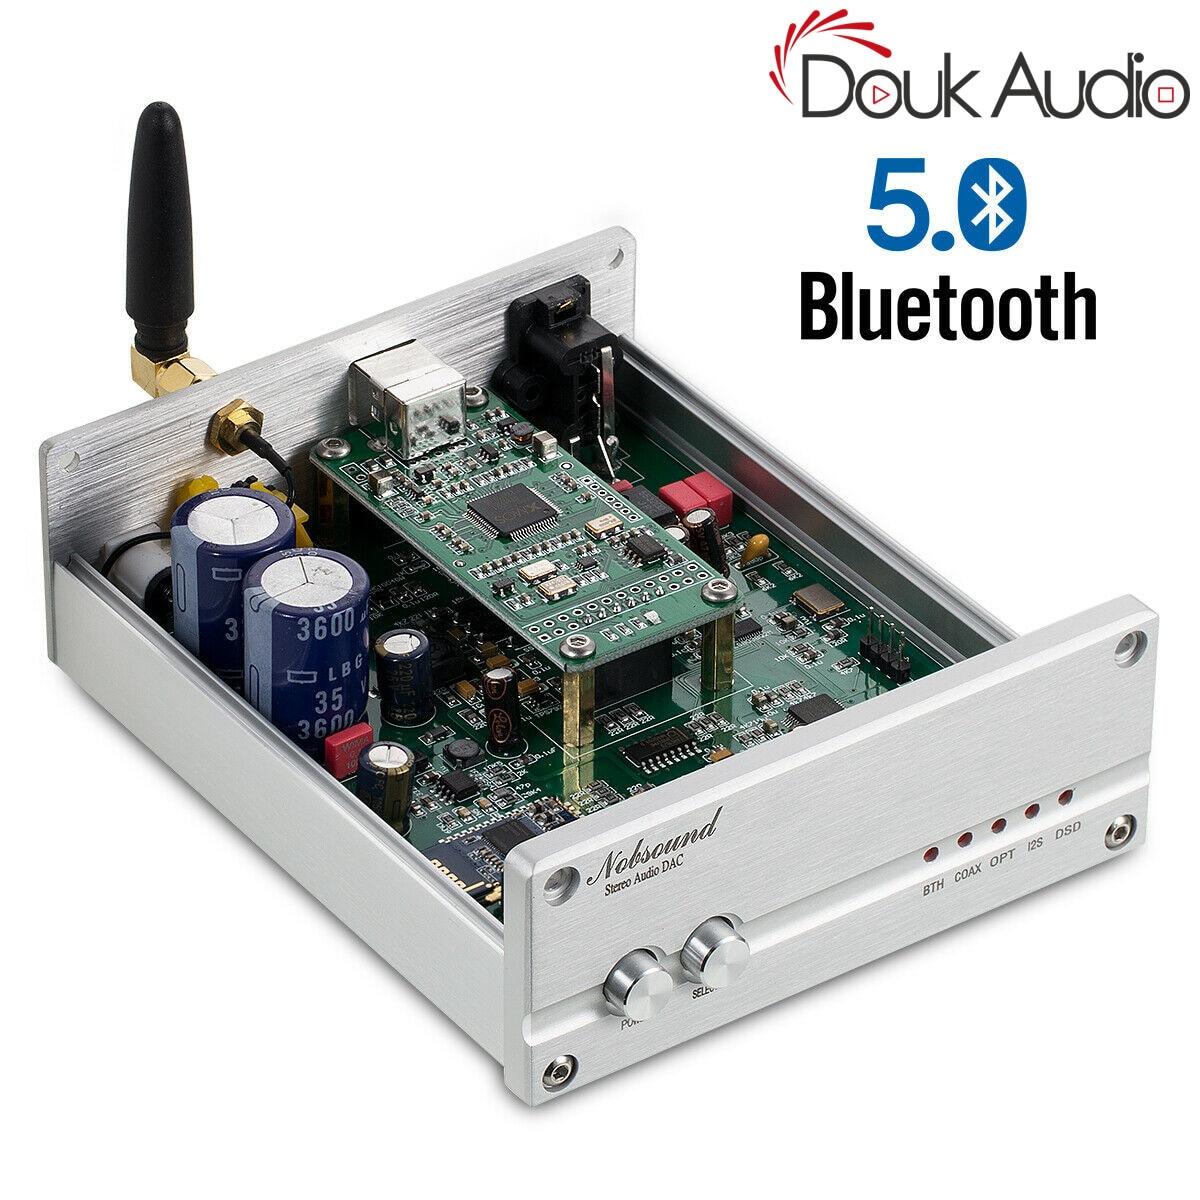 HiFi ES9038 Bluetooth 5.0 Audio Decoder USB DAC Opt/Coax Remote Control OLEDHiFi ES9038 Bluetooth 5.0 Audio Decoder USB DAC Opt/Coax Remote Control OLED